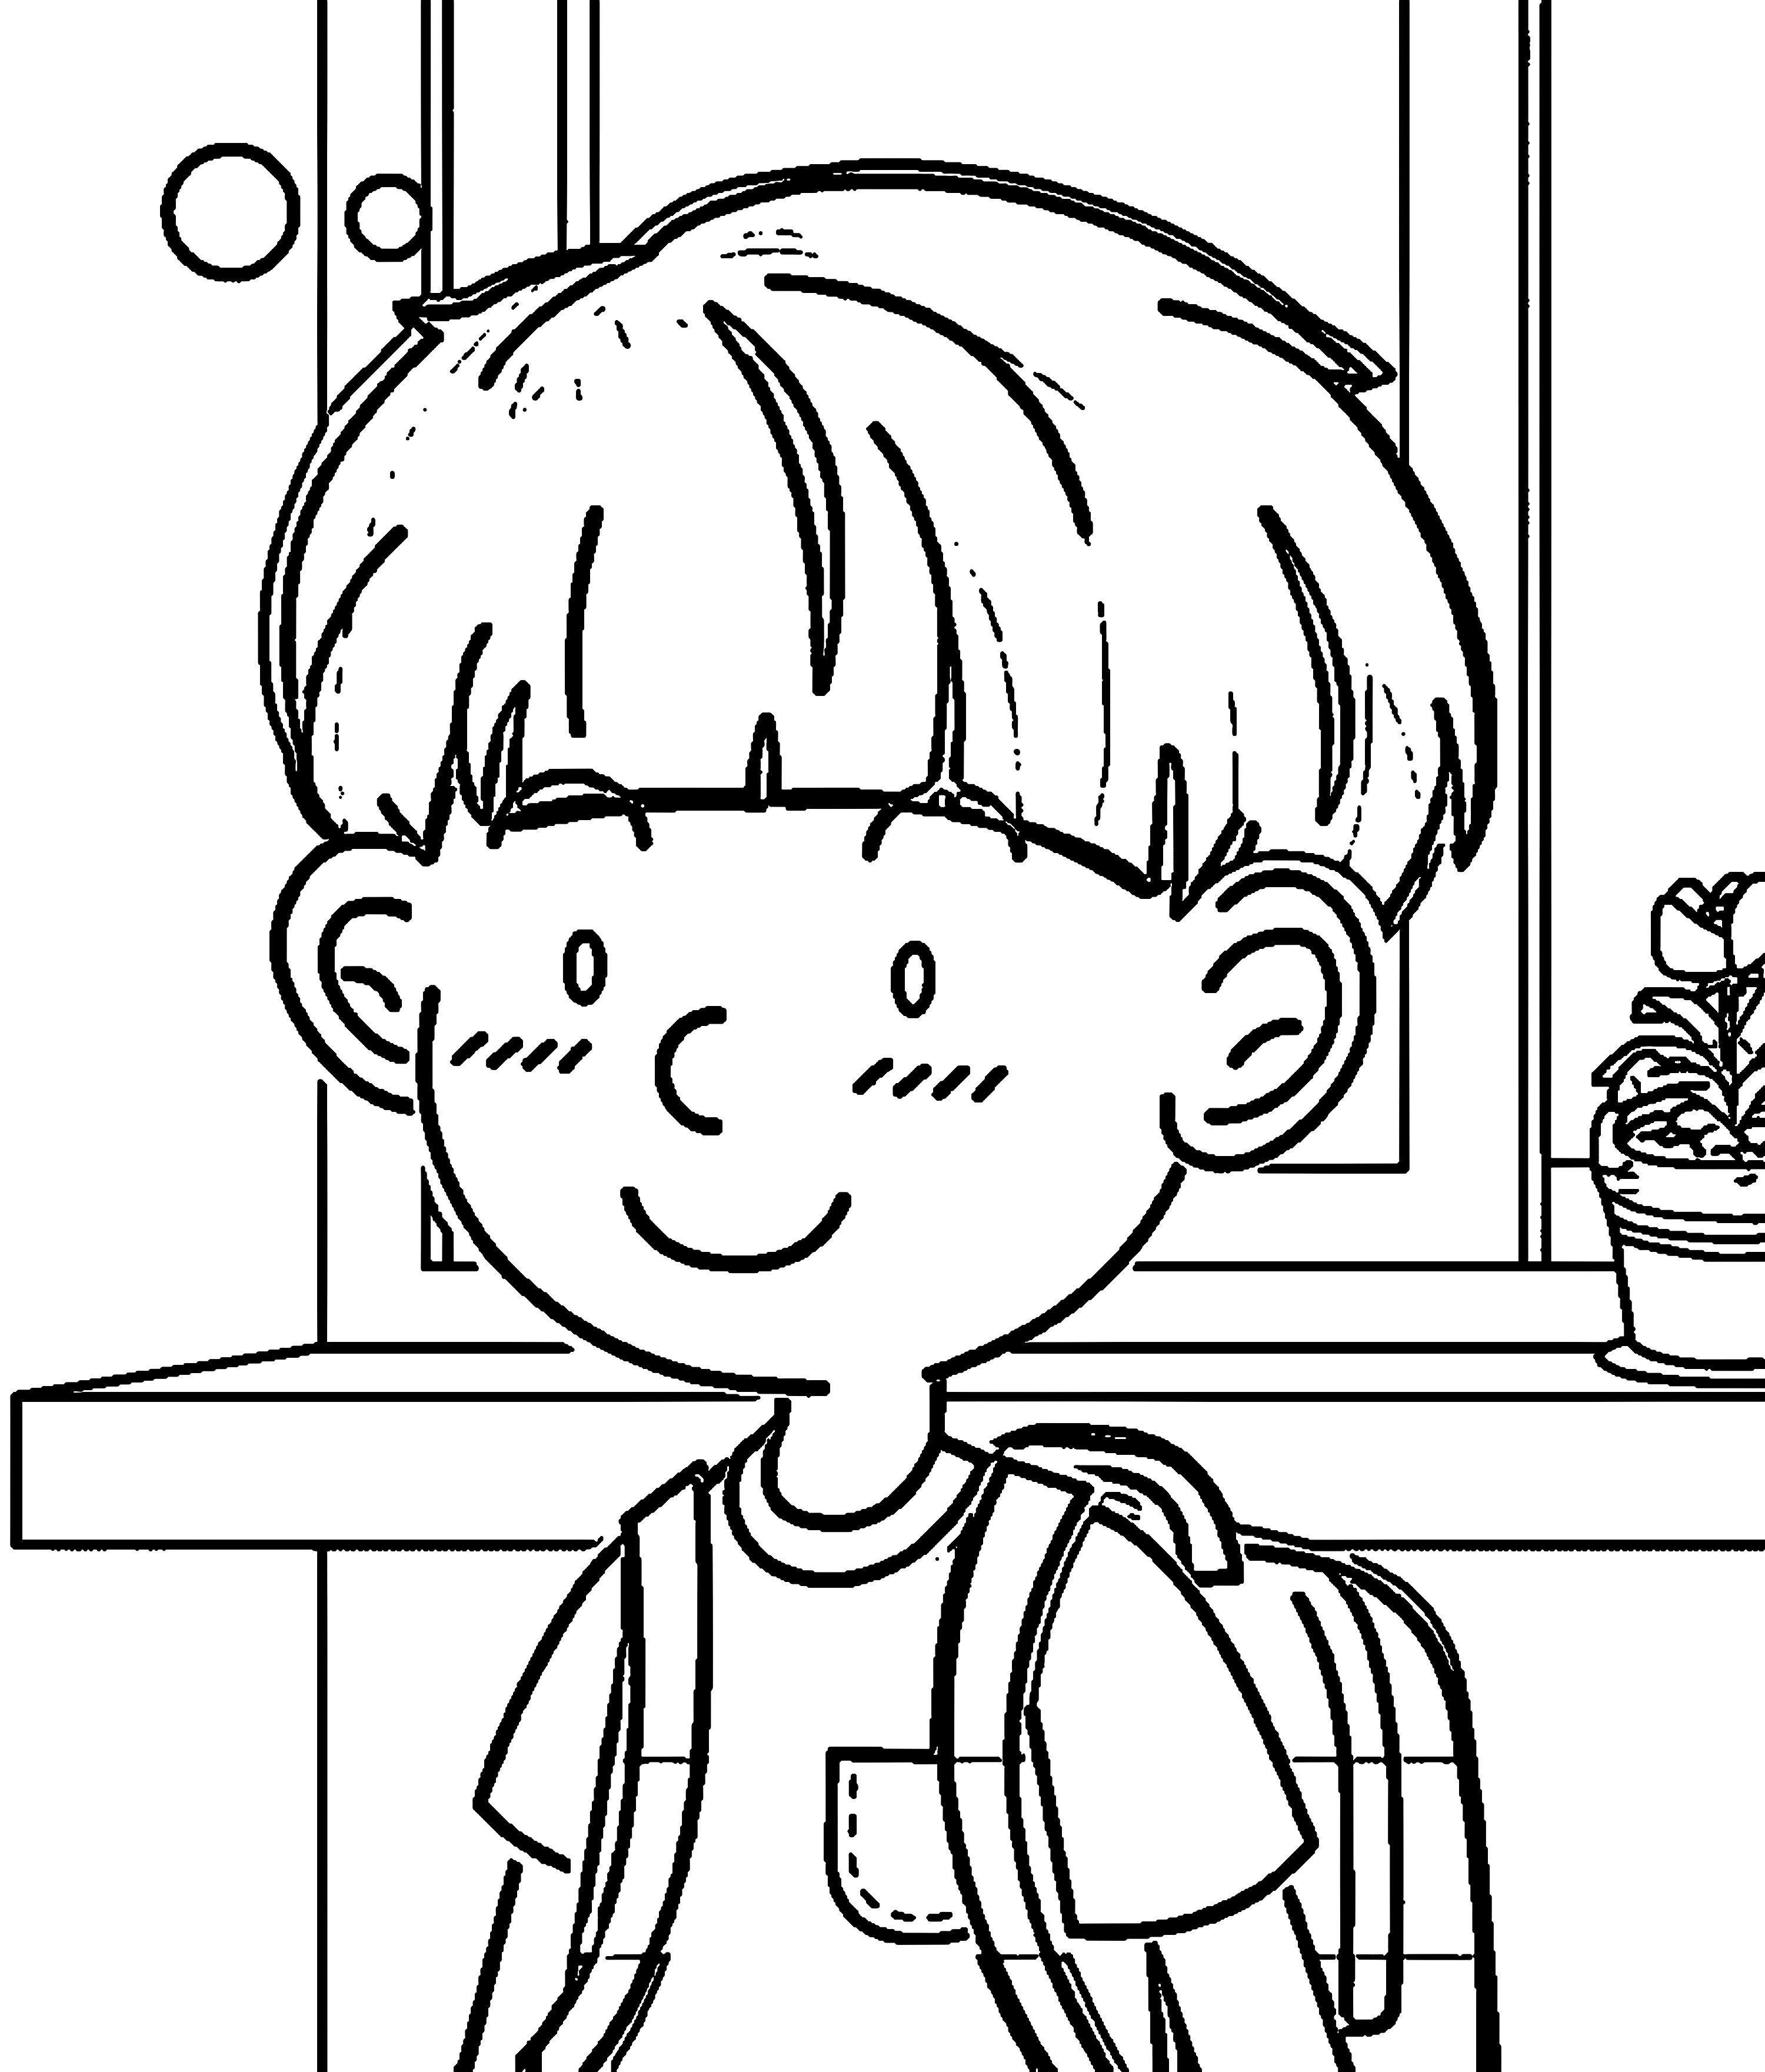 Speaking Cartoon Kids Coloring Page 54